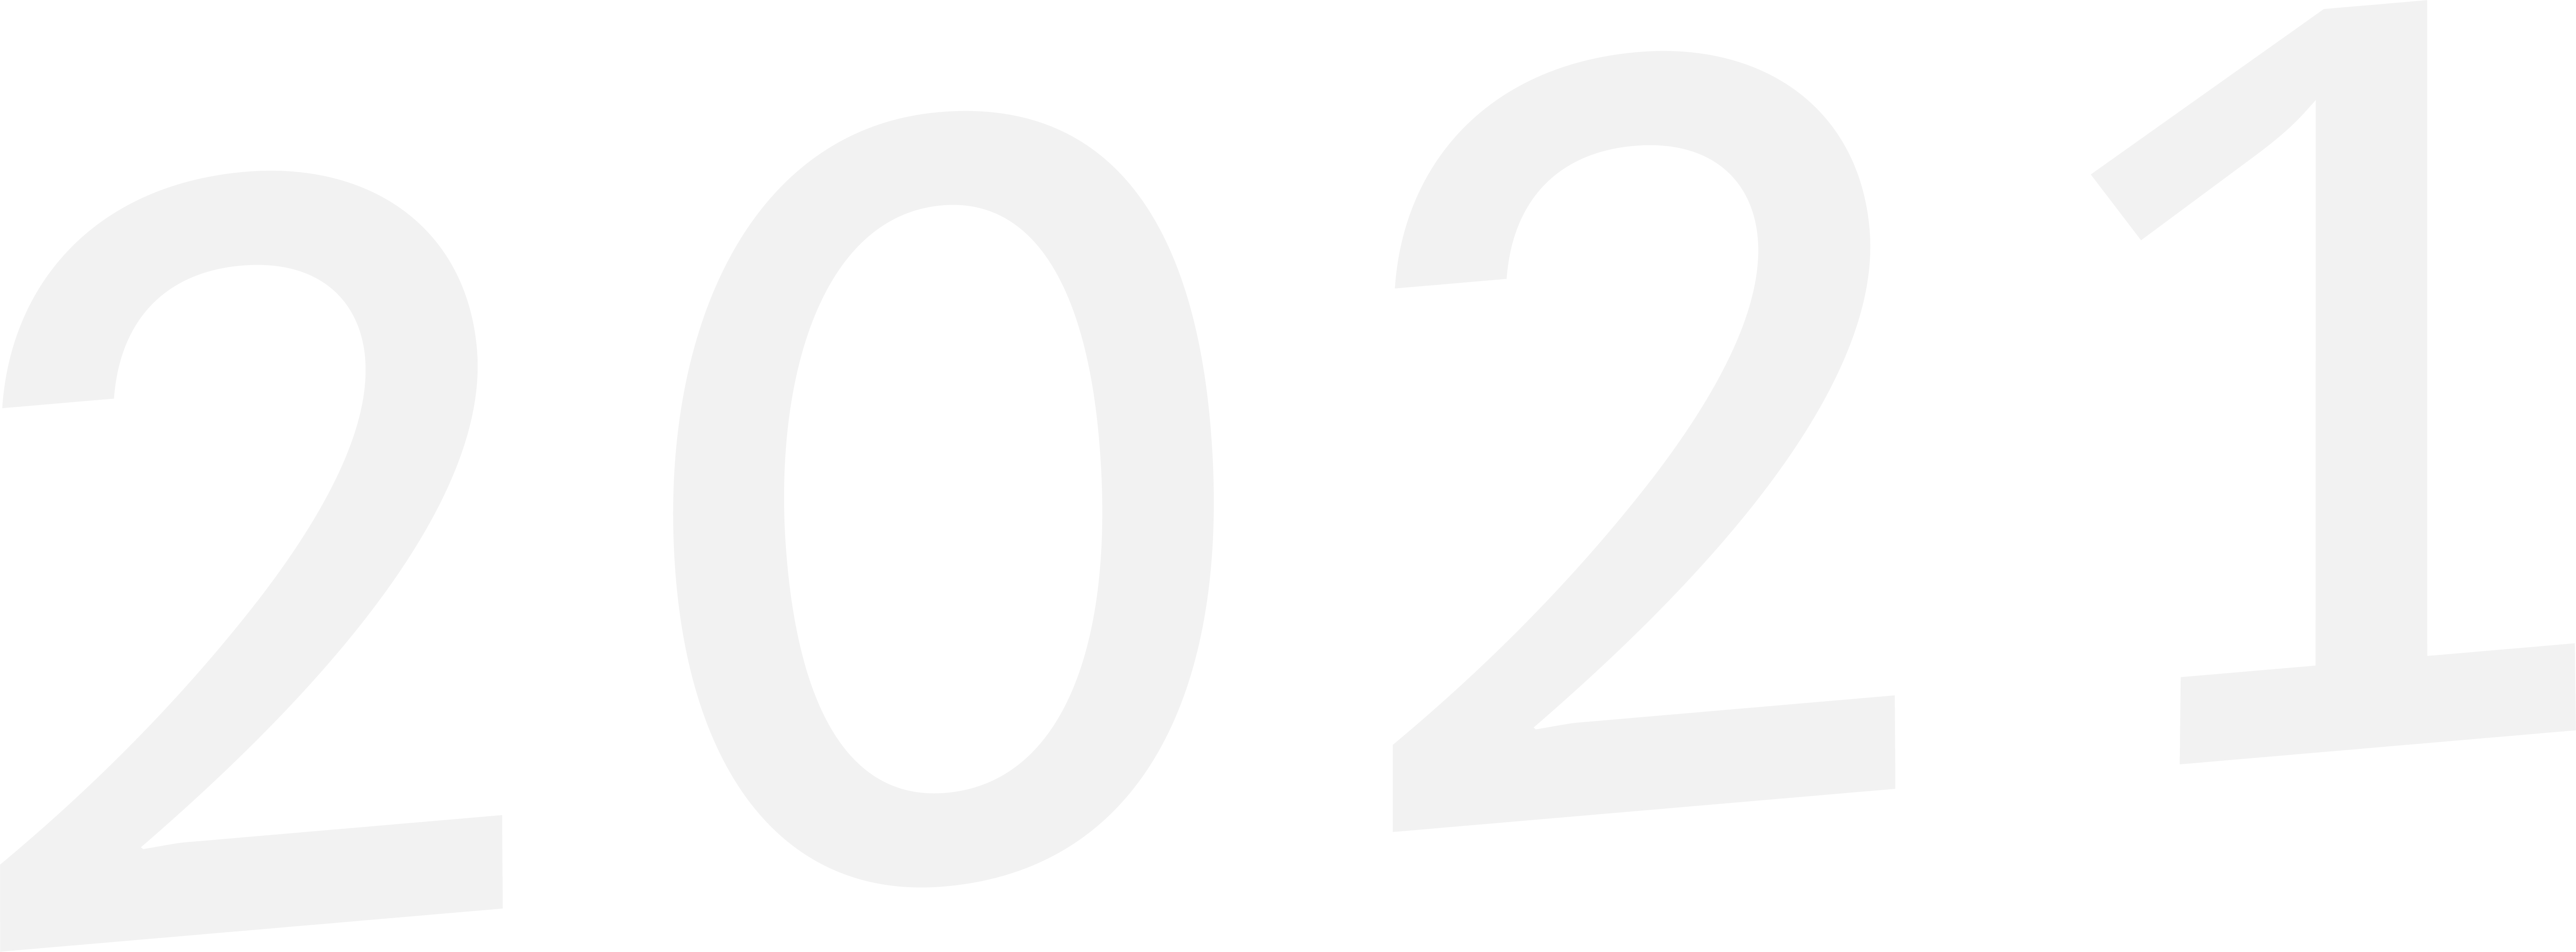 2021 graphic